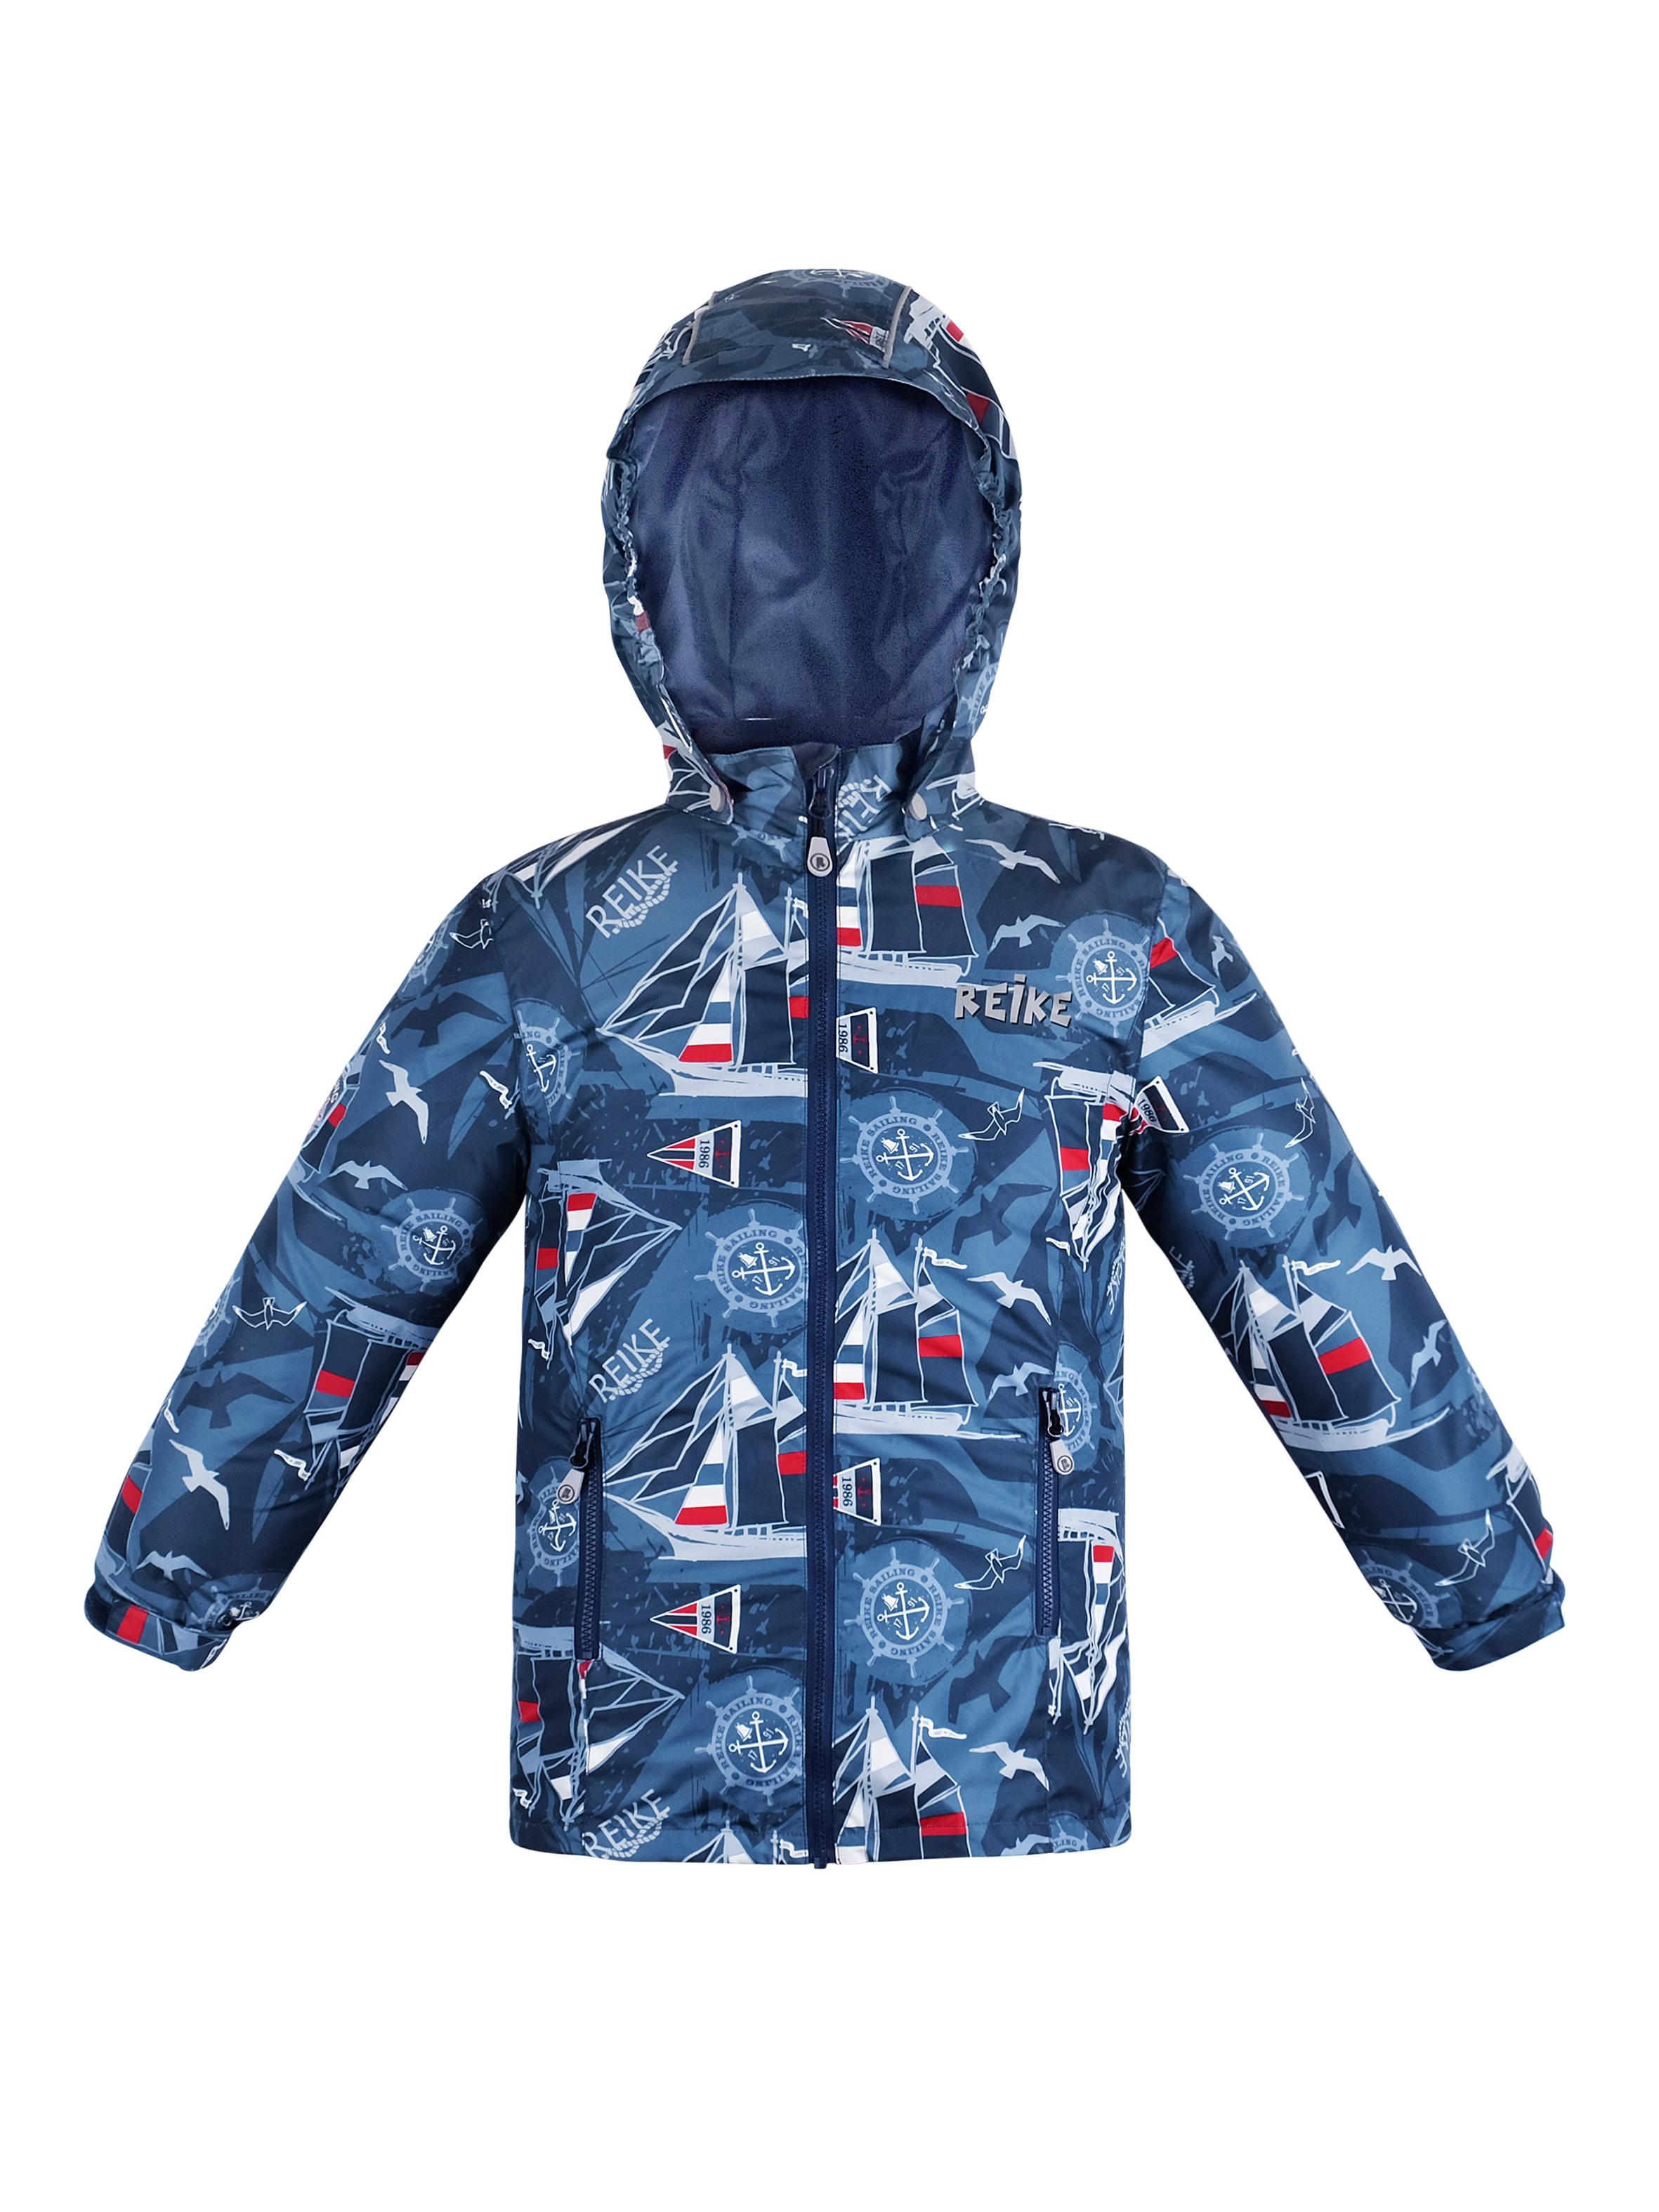 Куртка для мальчика Reike Sailing blue р.140